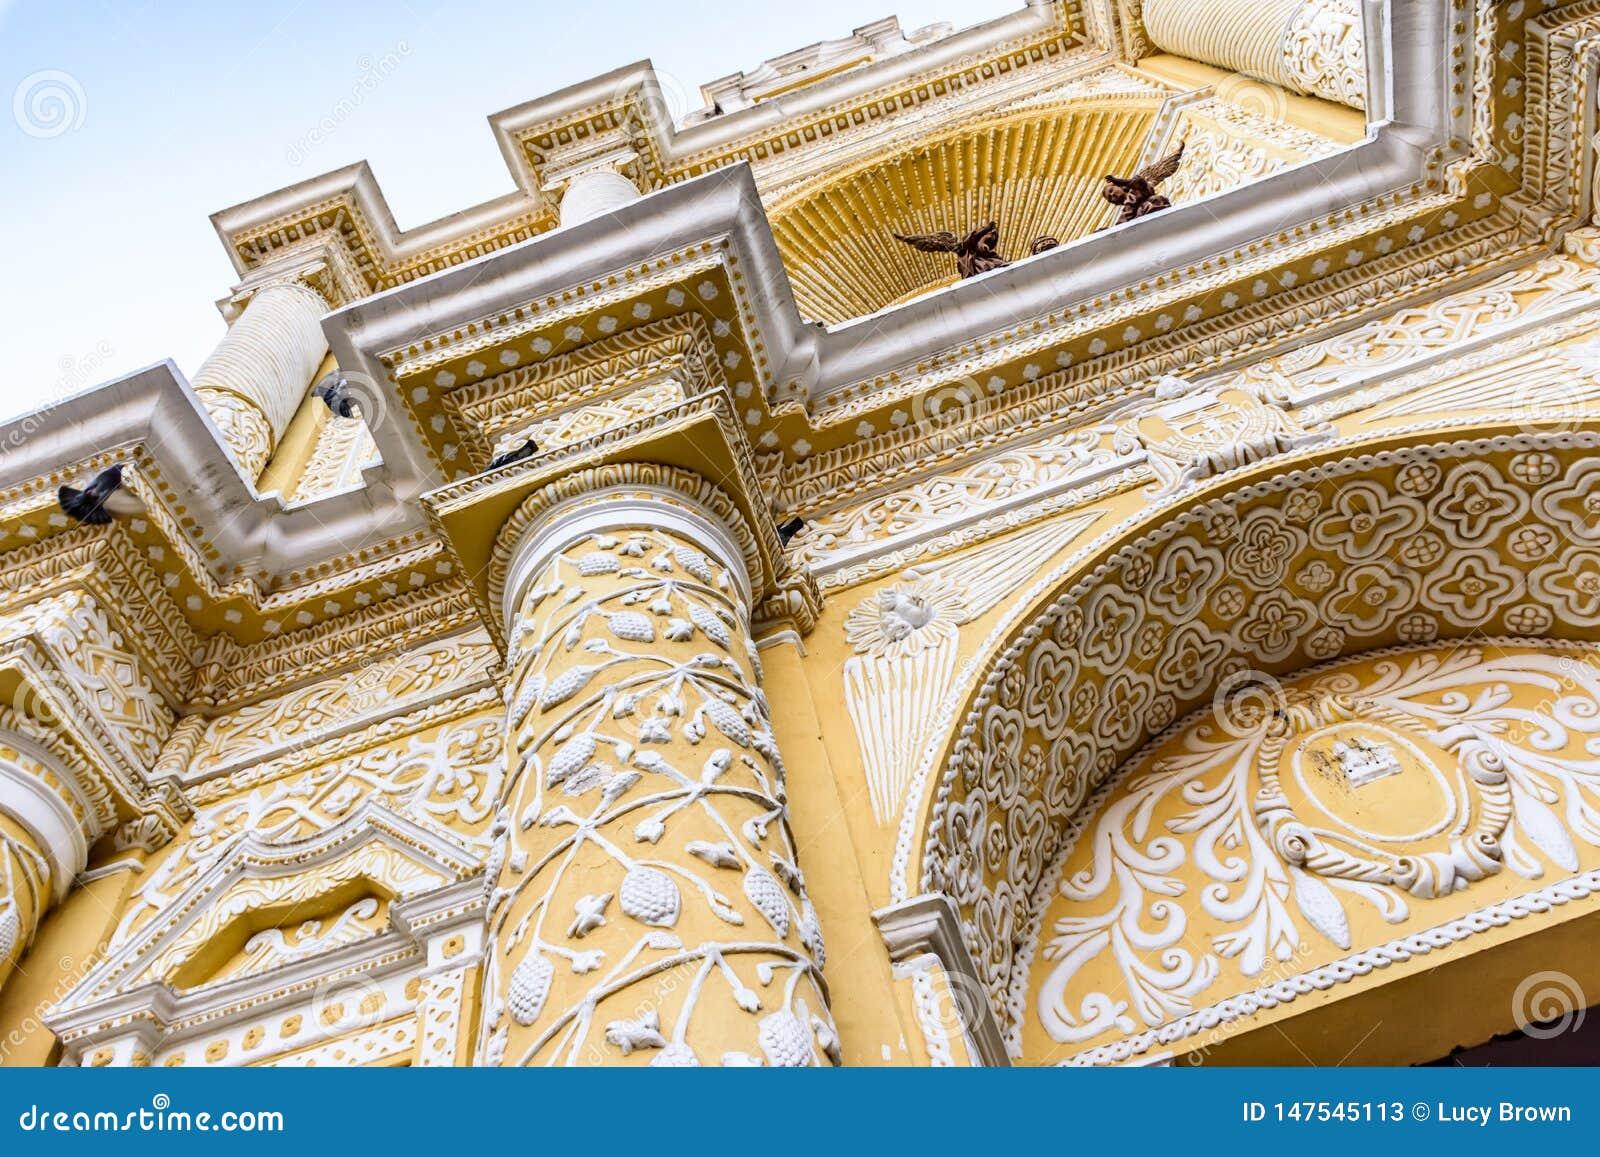 Baroque facade of La Merced church, Antigua, Guatemala